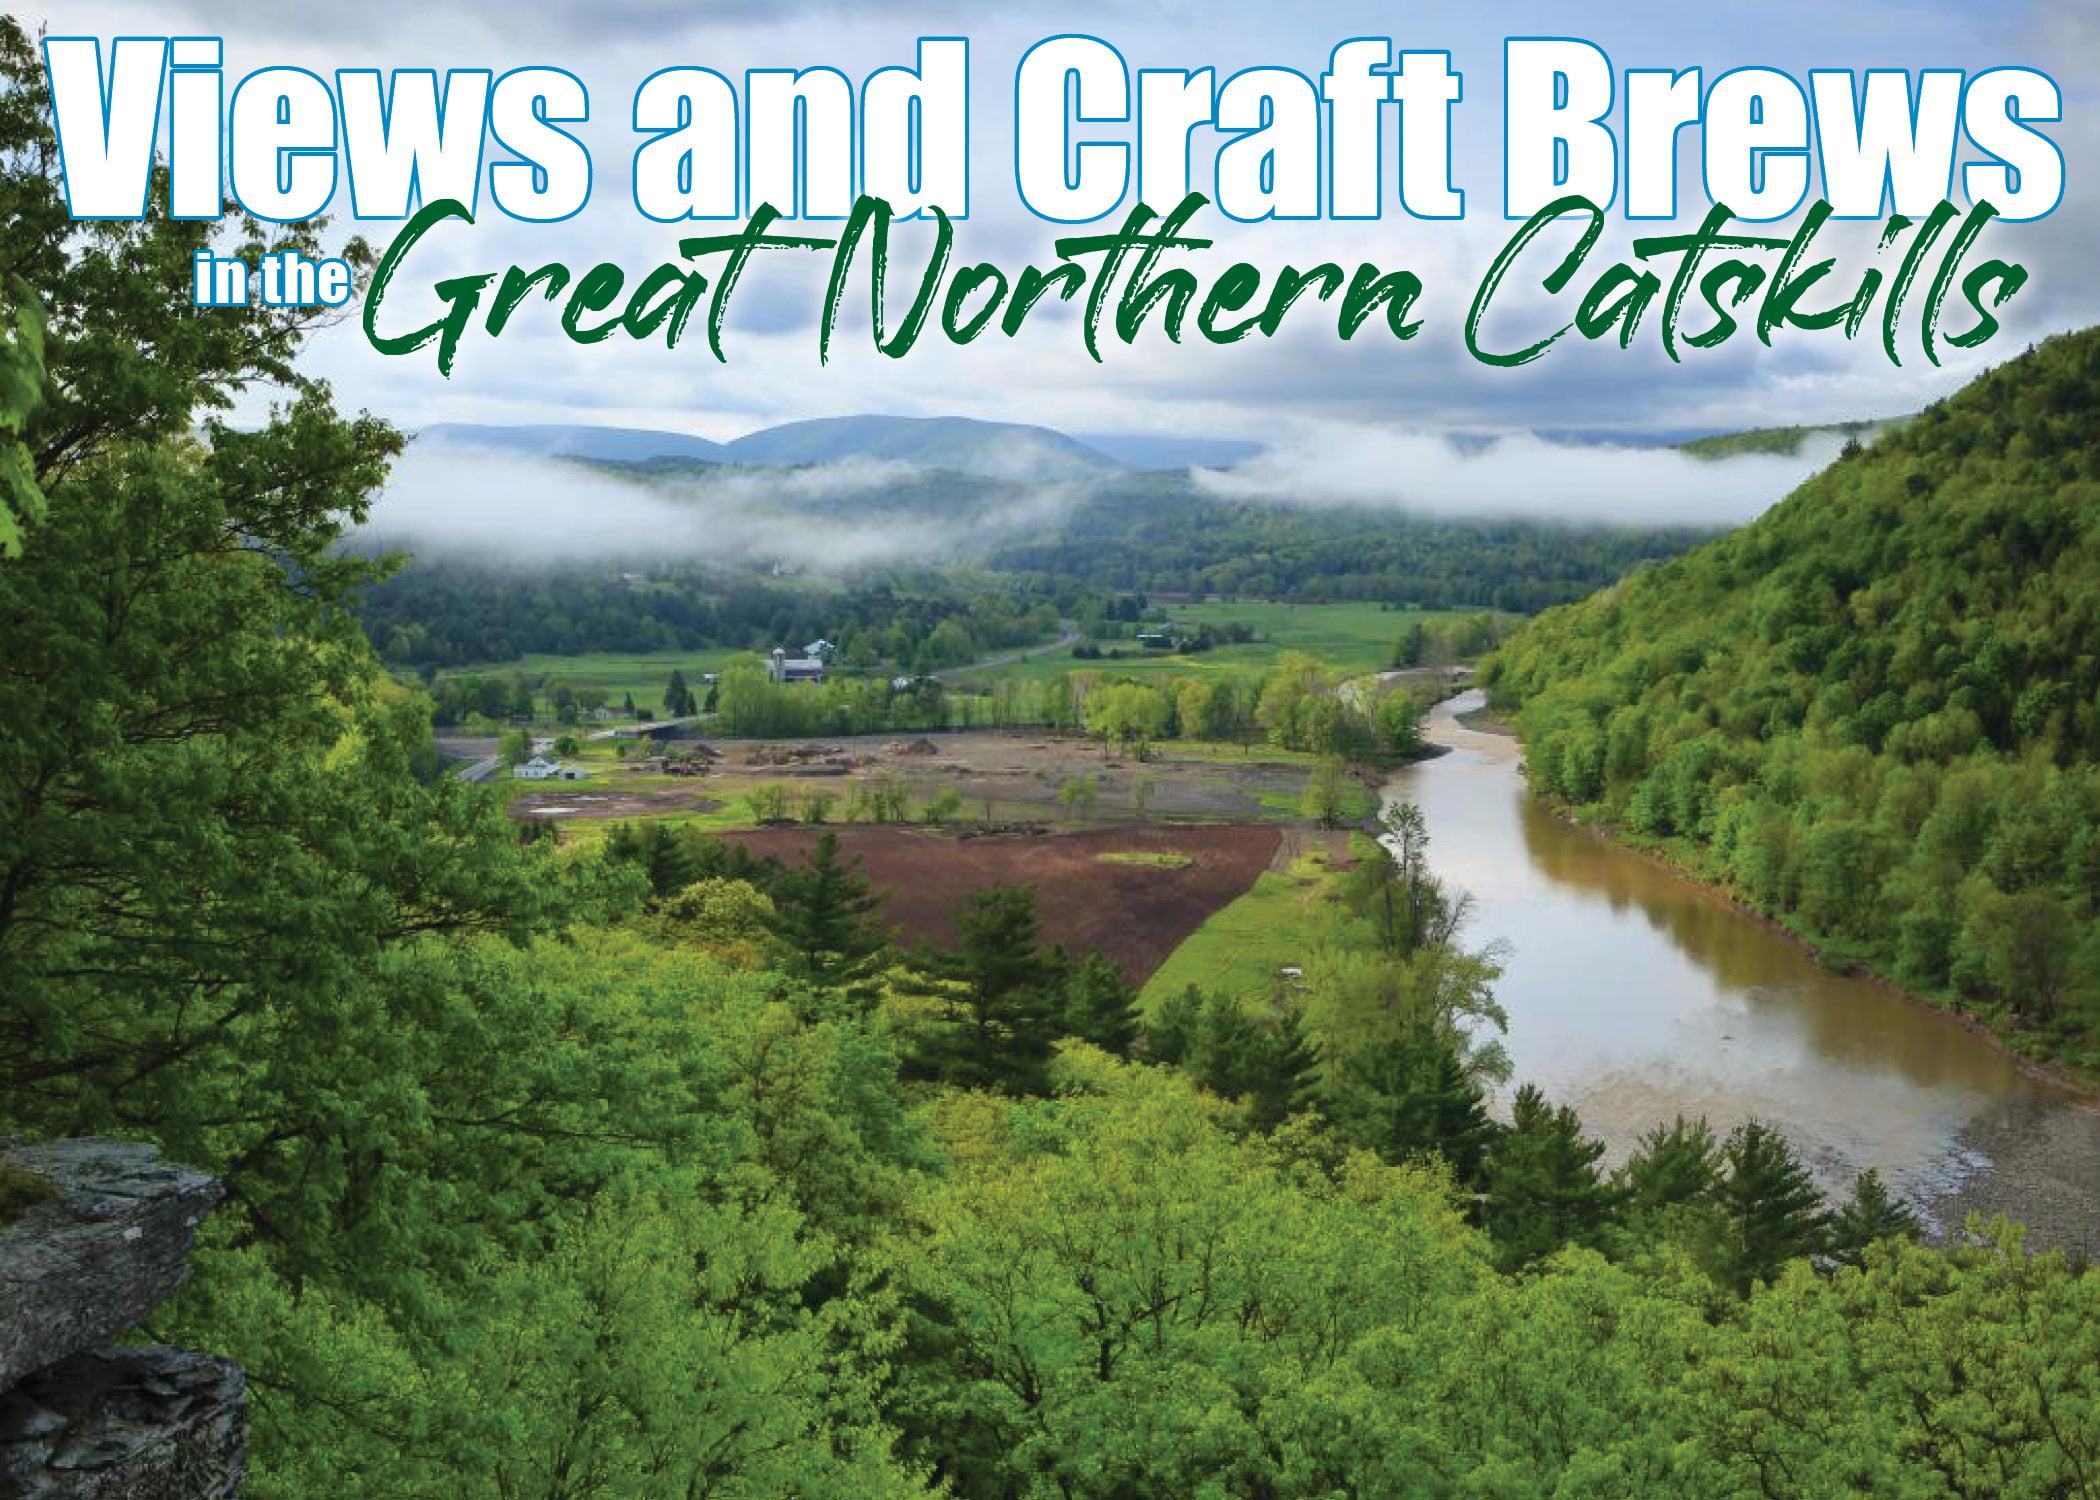 Catskills Breweries Header